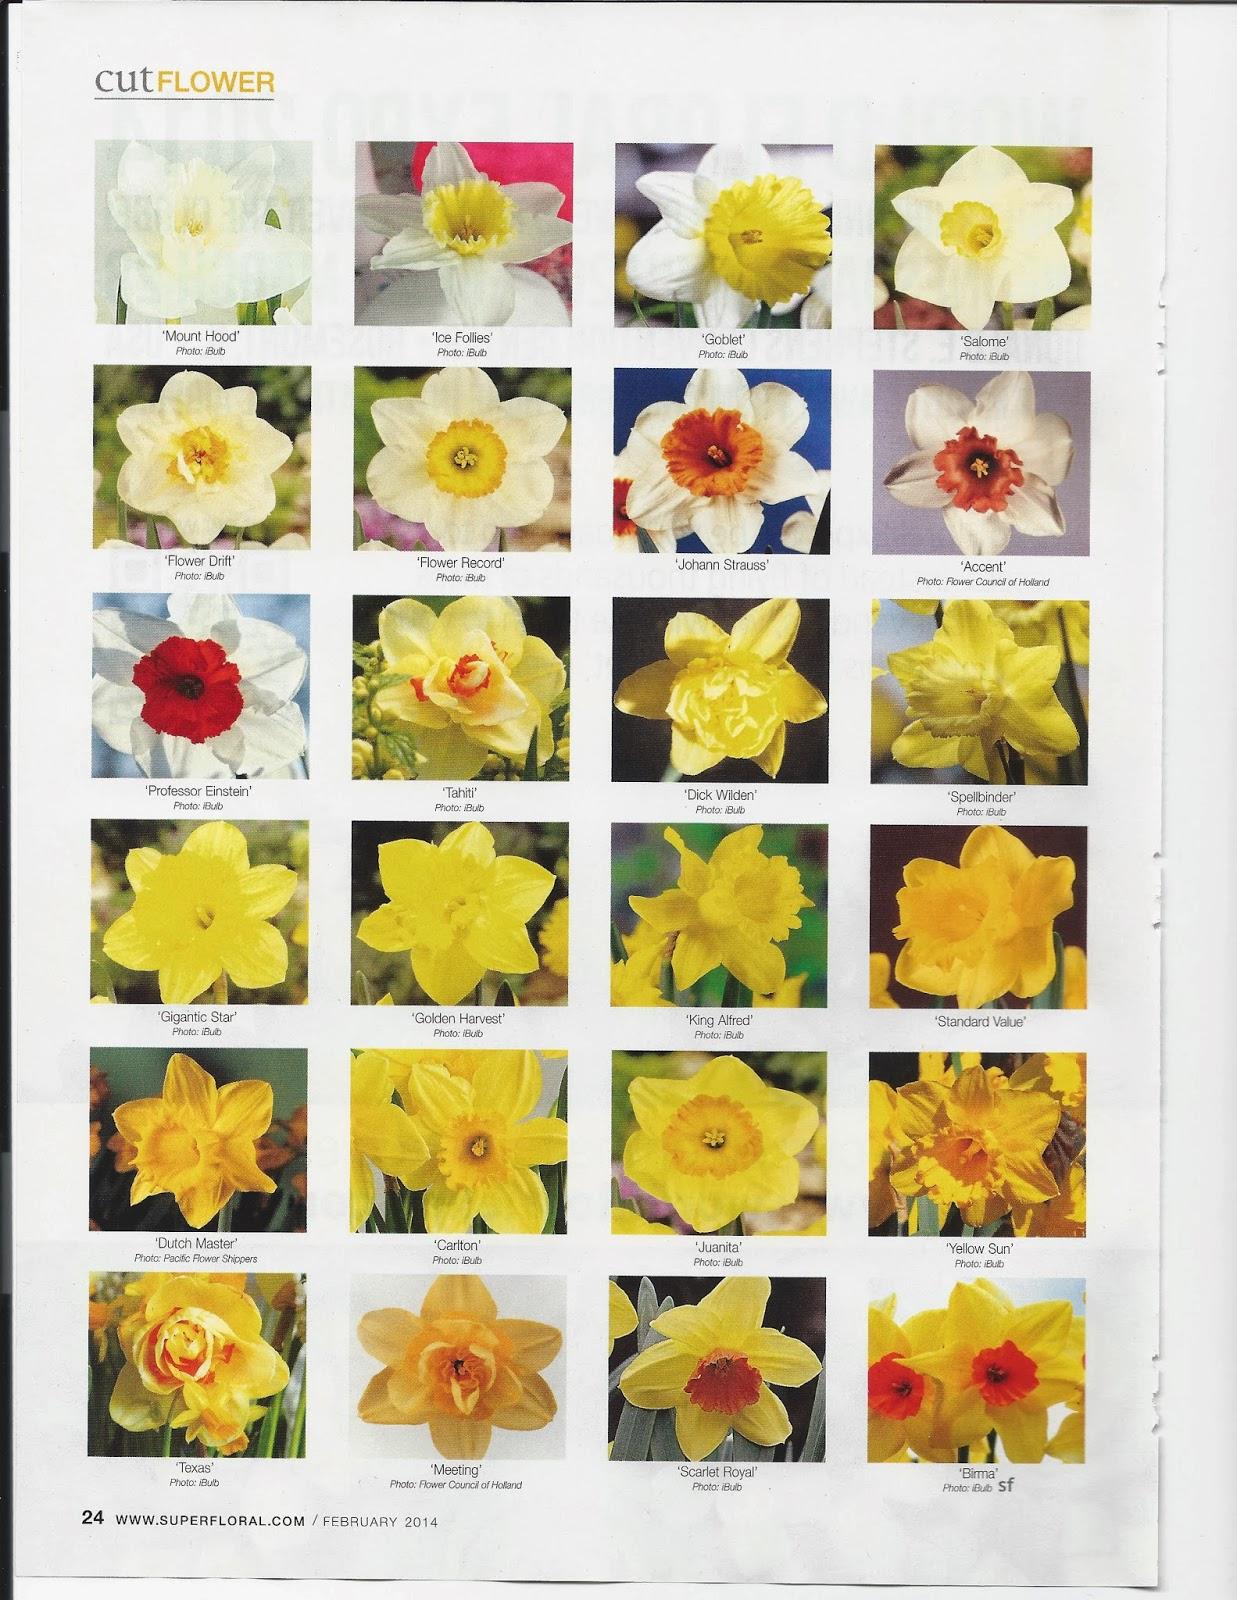 Flower classroom cut flower daffodil varieties care handling cut flower daffodil varieties care handling izmirmasajfo